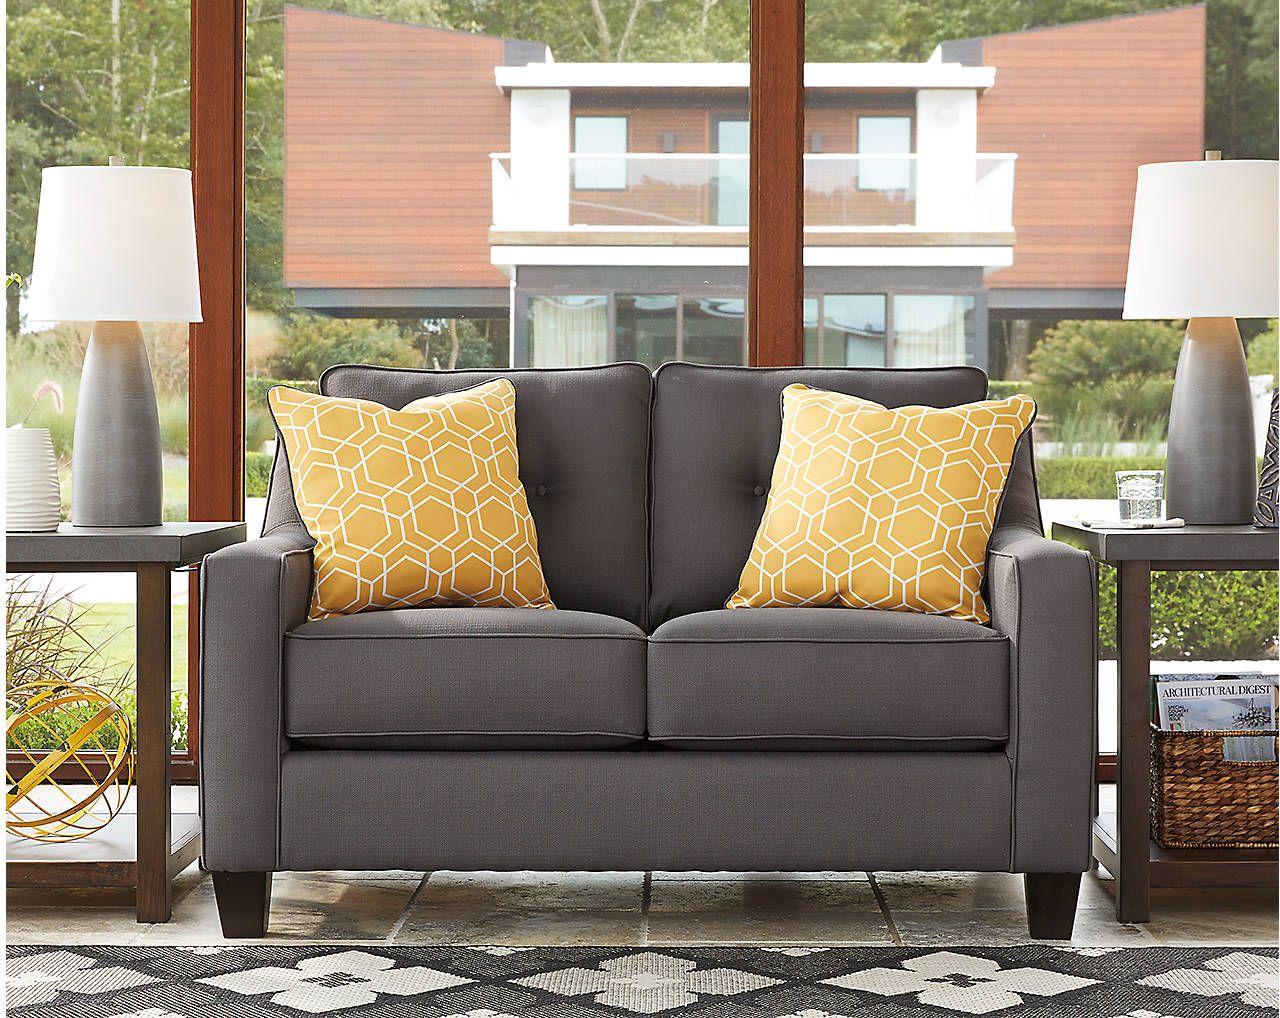 Wondrous Benchcraft Aldie Nuvella Gray Loveseat 6870235 Vans Ibusinesslaw Wood Chair Design Ideas Ibusinesslaworg